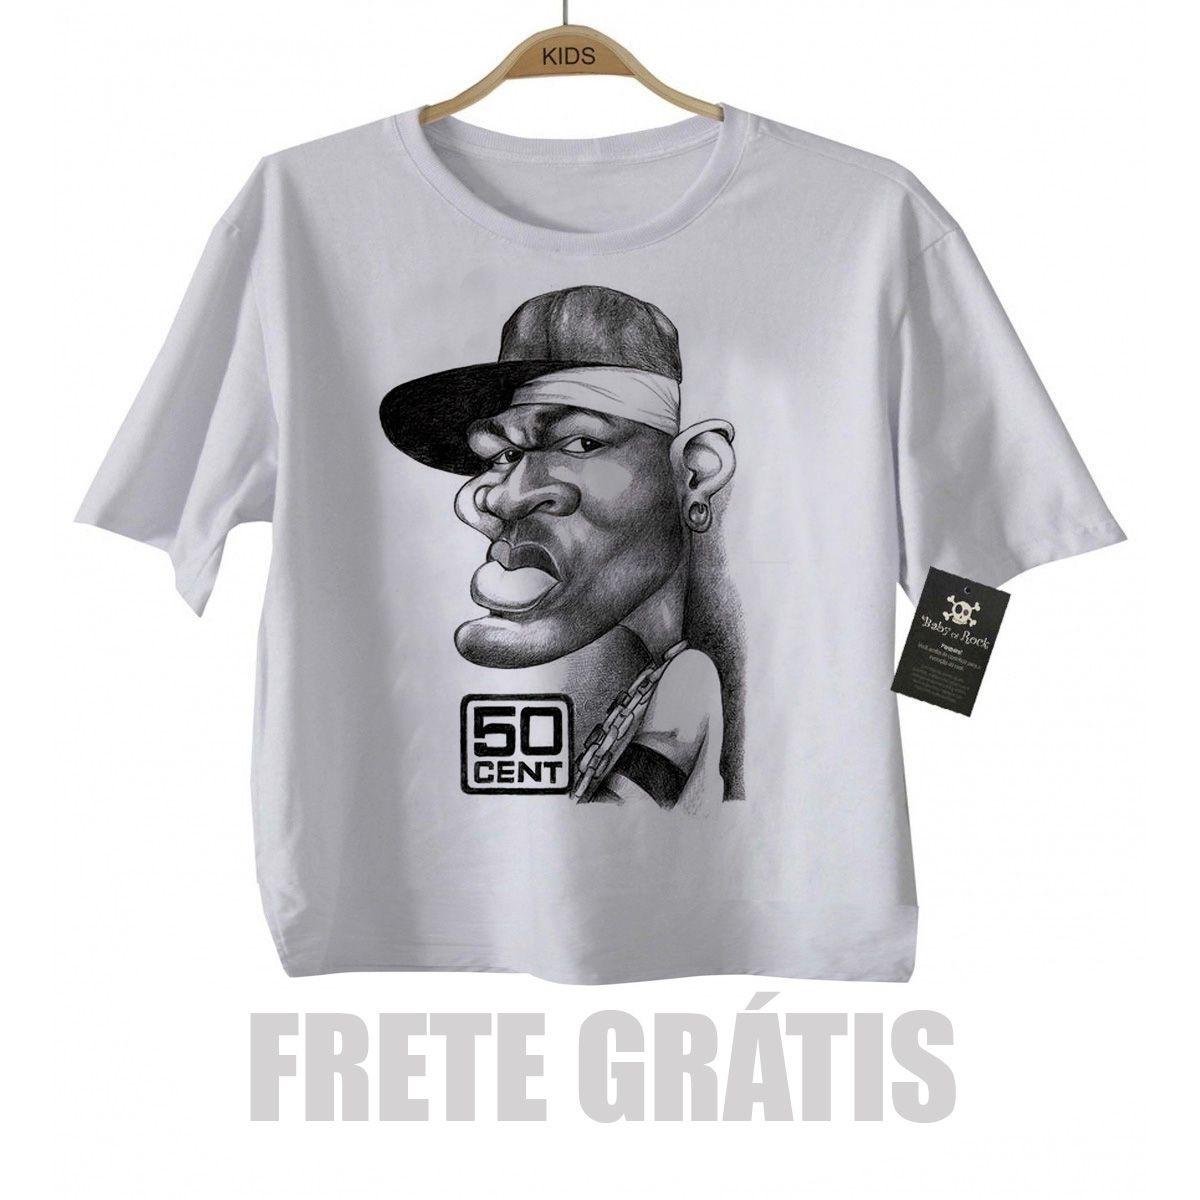 Camiseta Infantil  Rap / Hip hop   Baby 50 cent  - White  - Baby Monster S/A